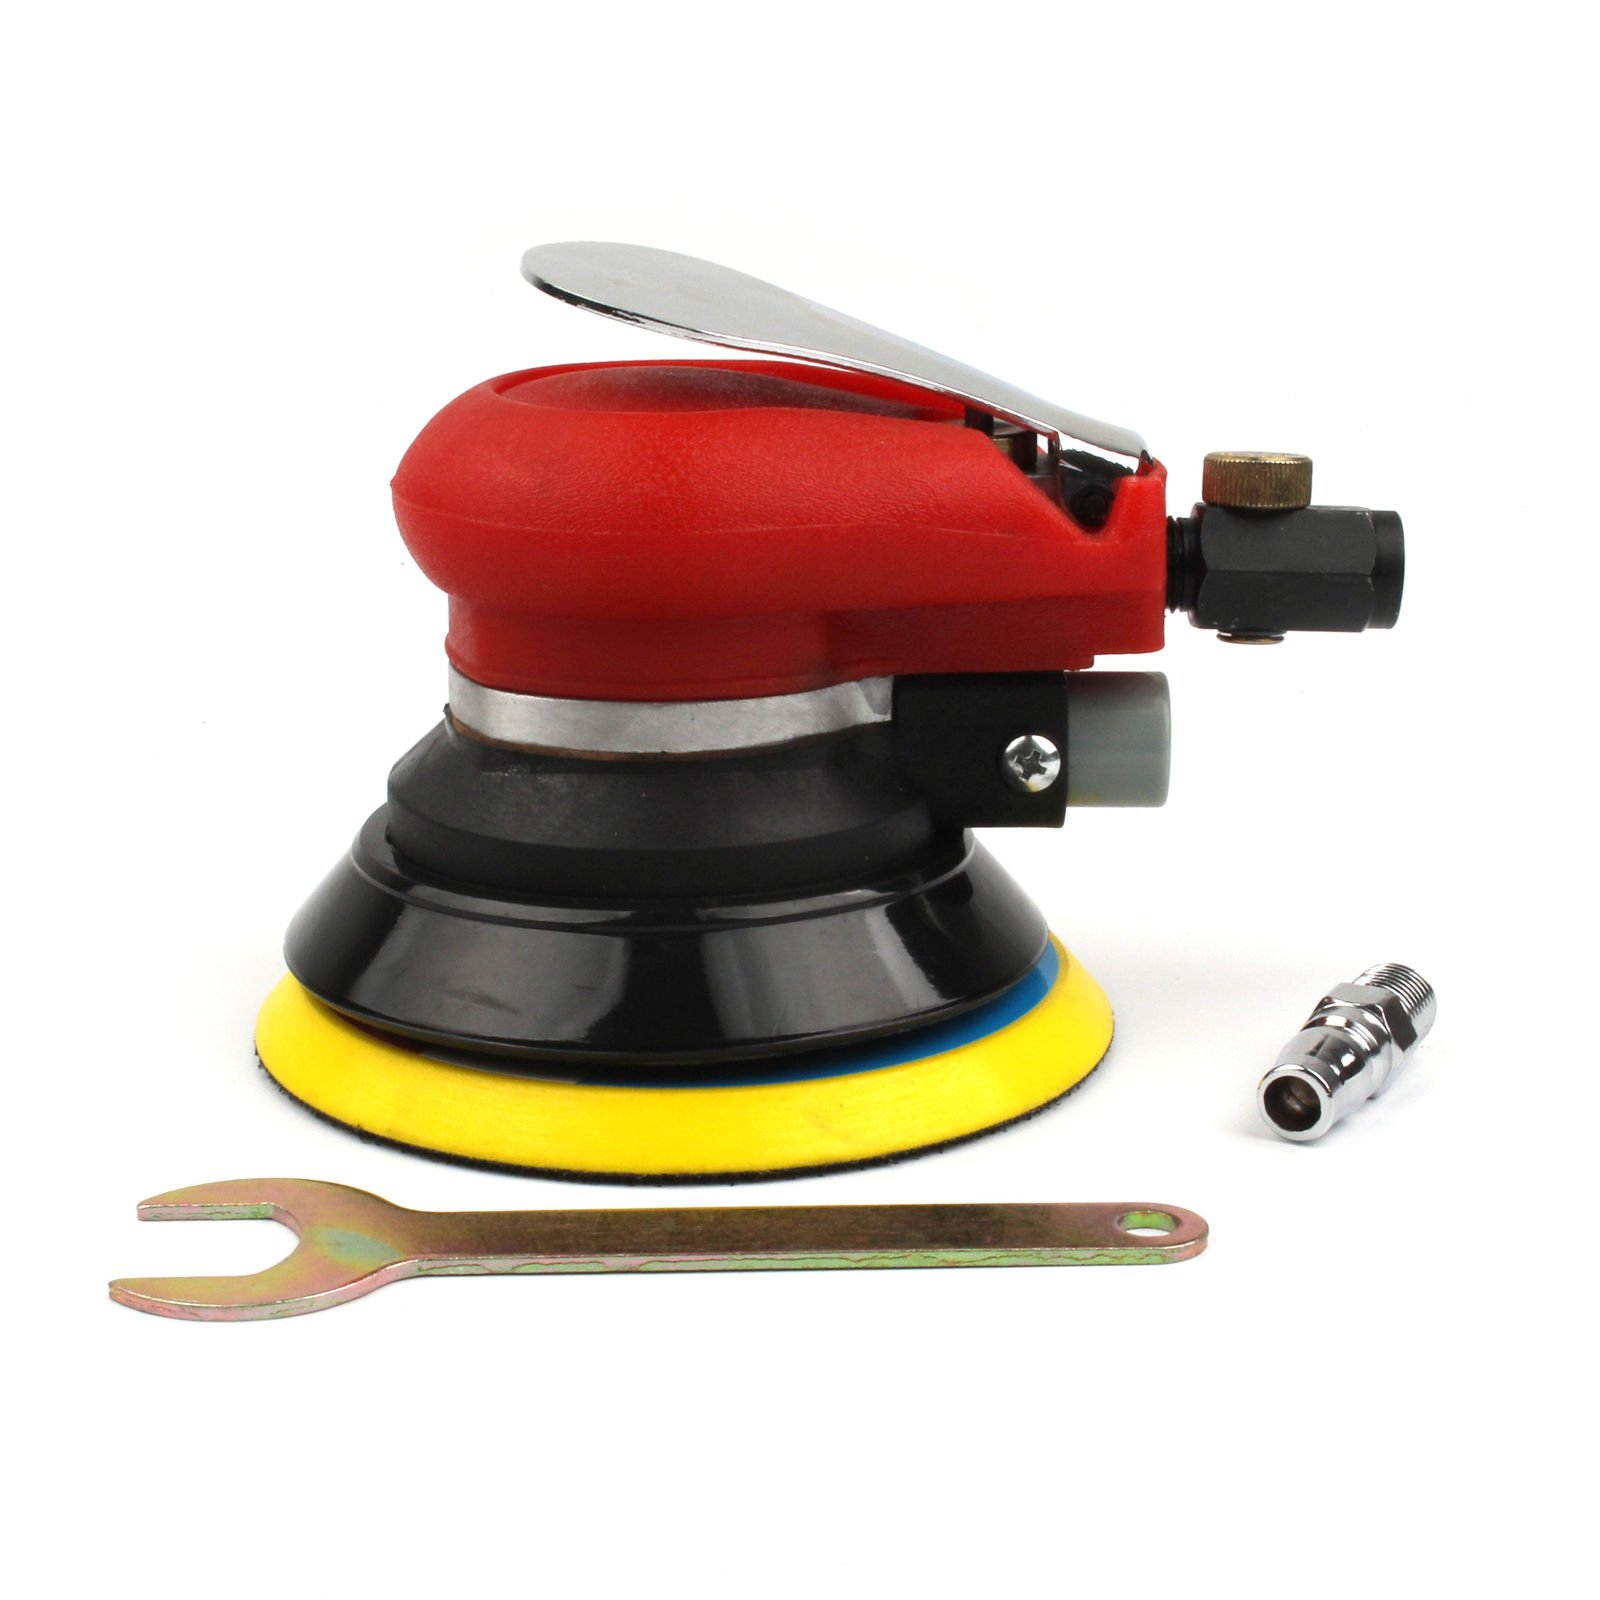 5''inch Professional Air Random Orbital Palm Sander, Dual Action Pneumatic Sander, Low Vibration, Heavy Duty